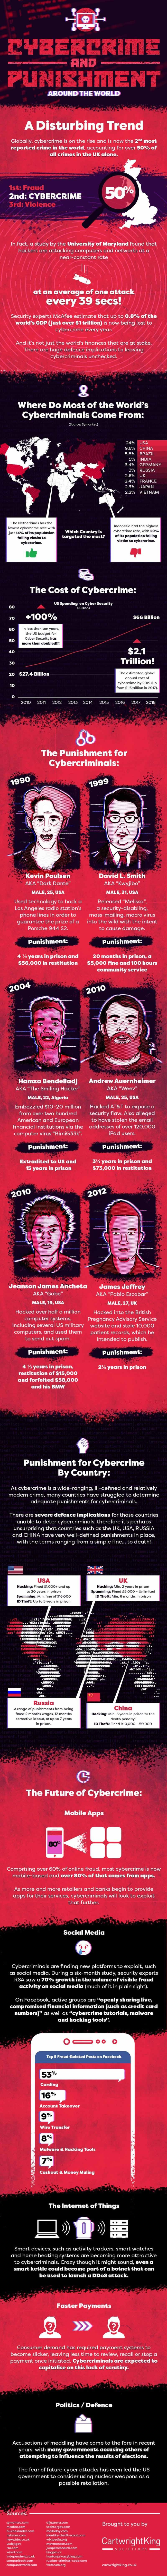 Cybercrime and Punishment Around the World